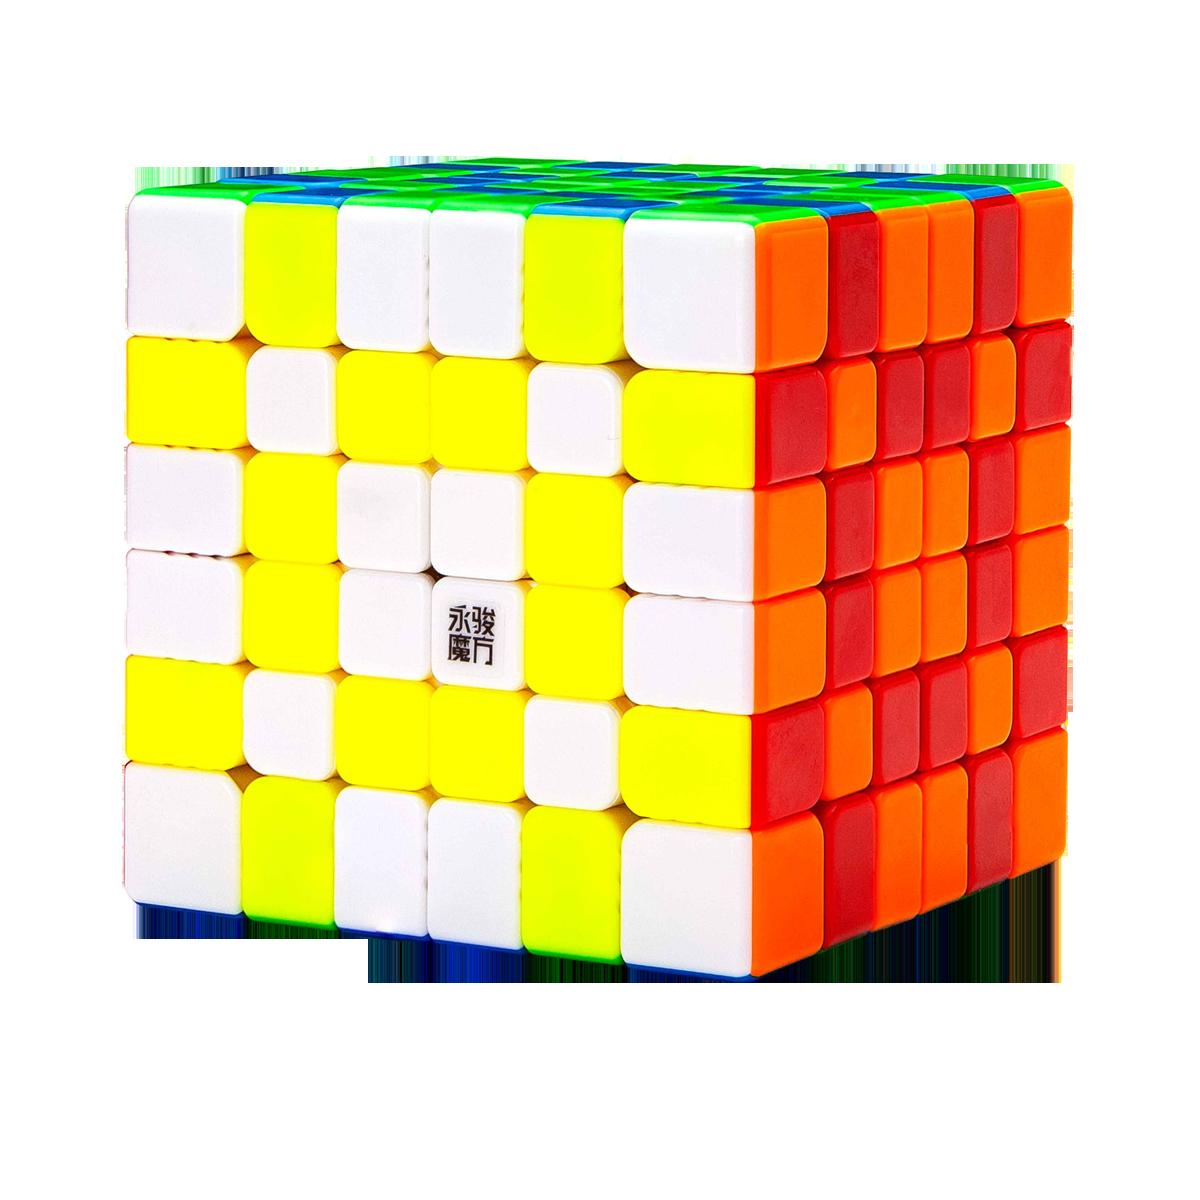 6x6x6 Yushi M